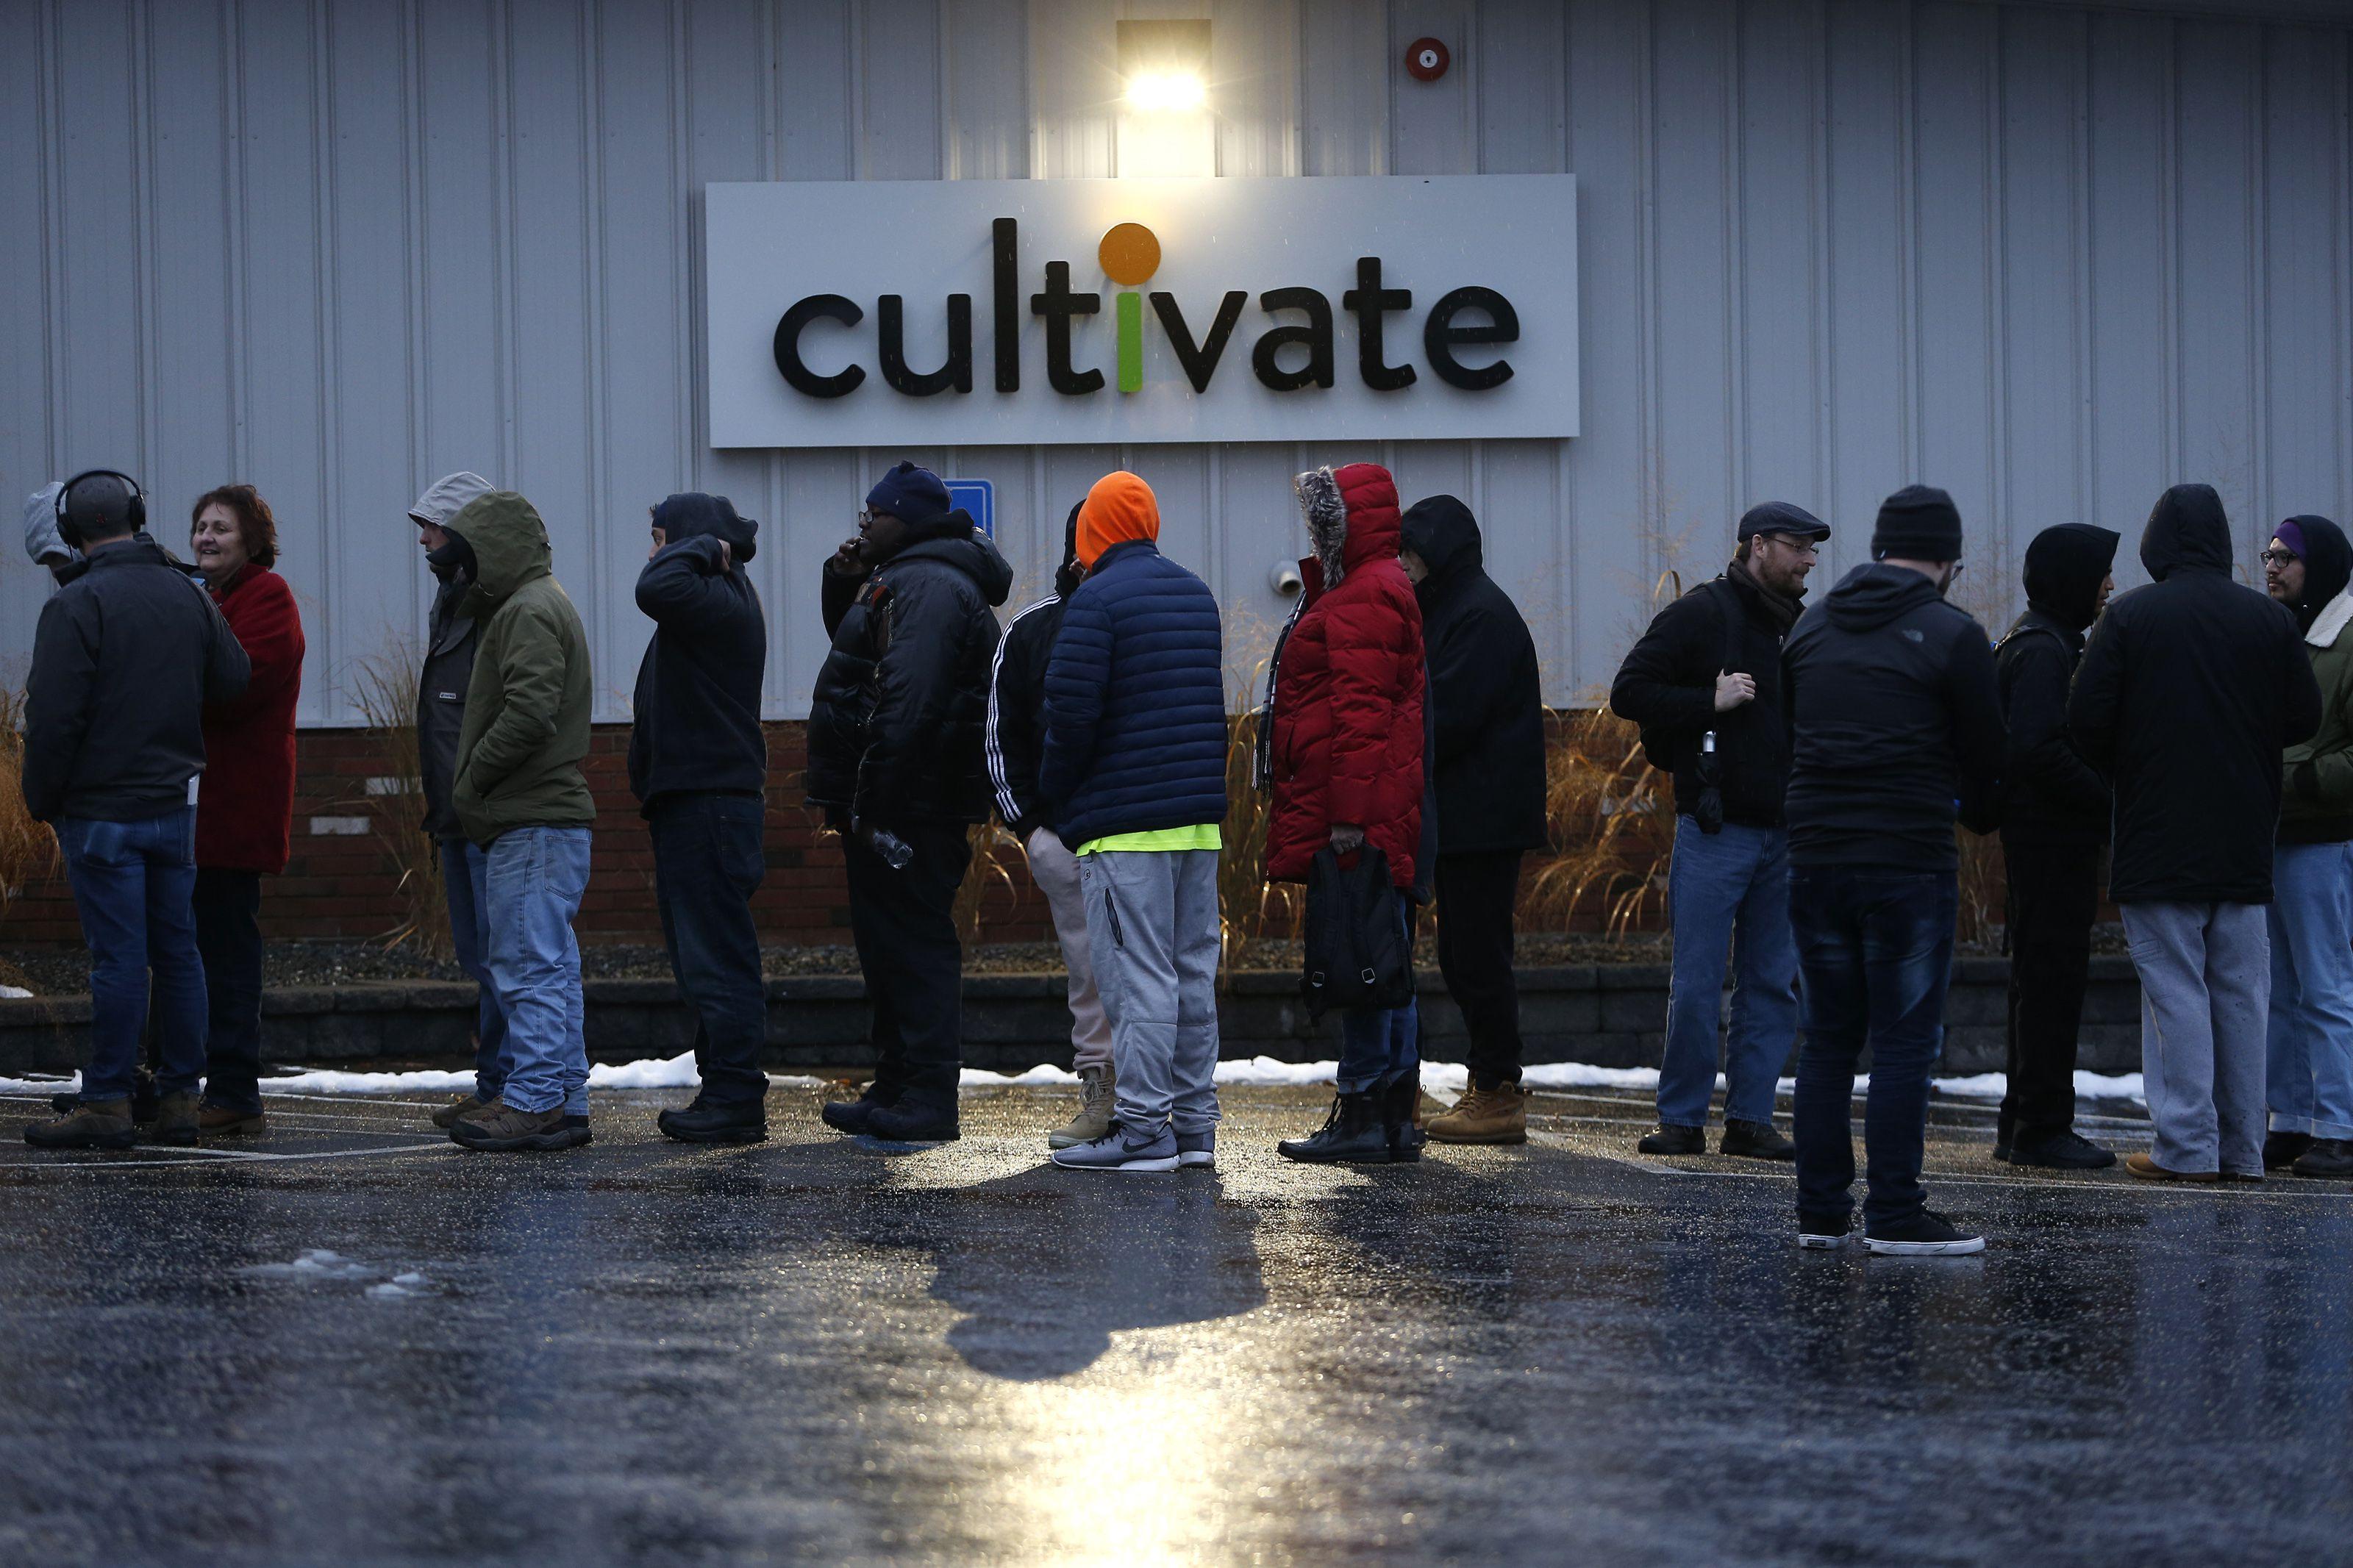 Recreational marijuana sales begin in Massachusetts, first